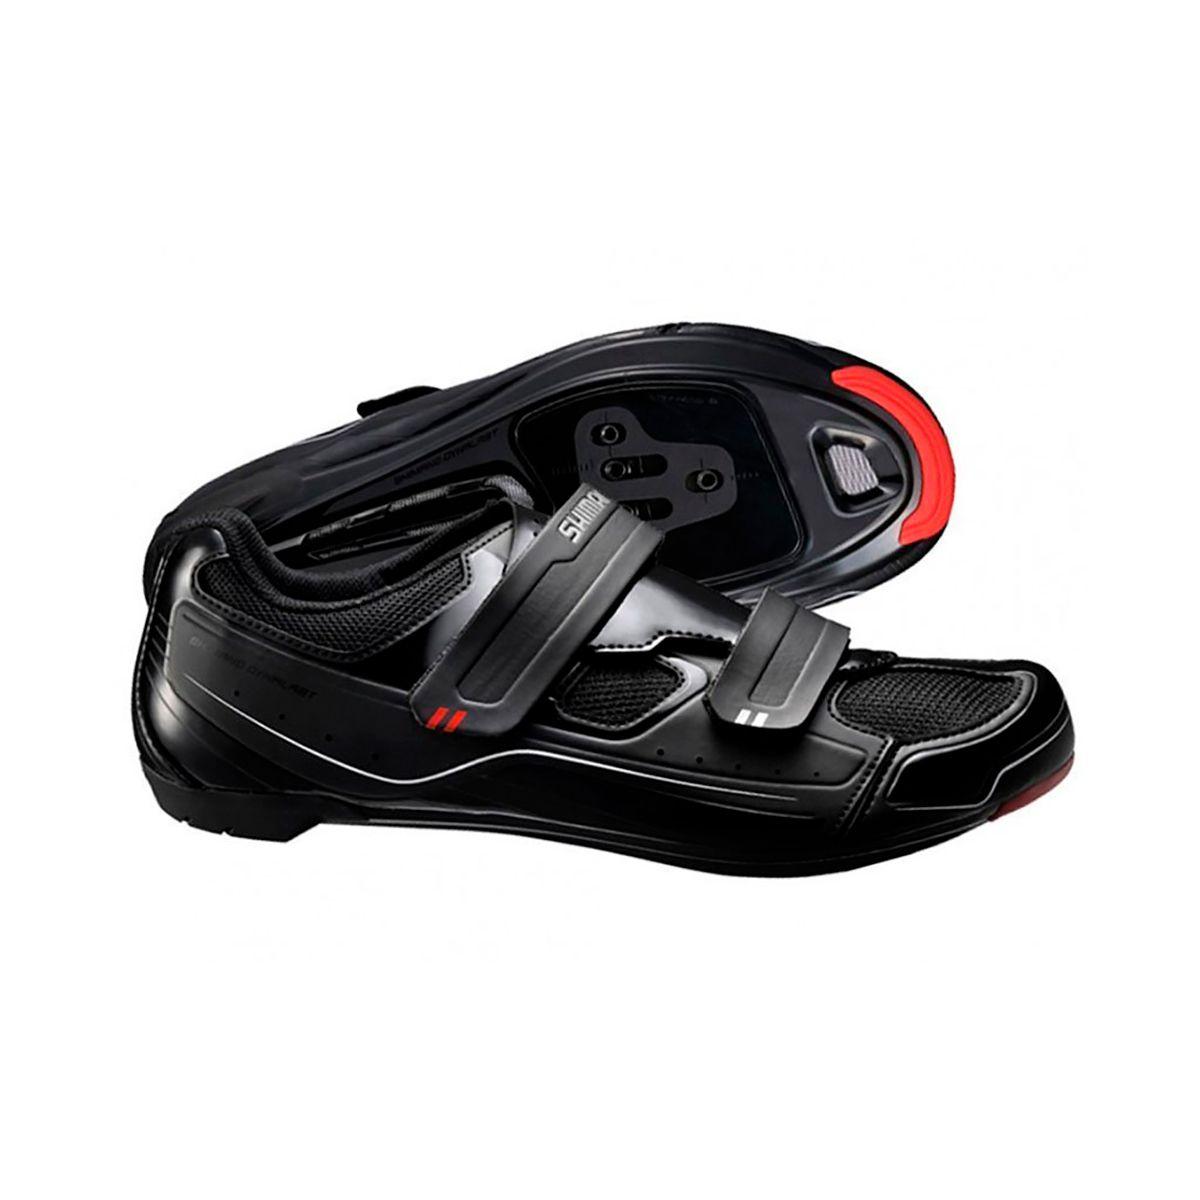 Sapatilha Shimano Speed - R065